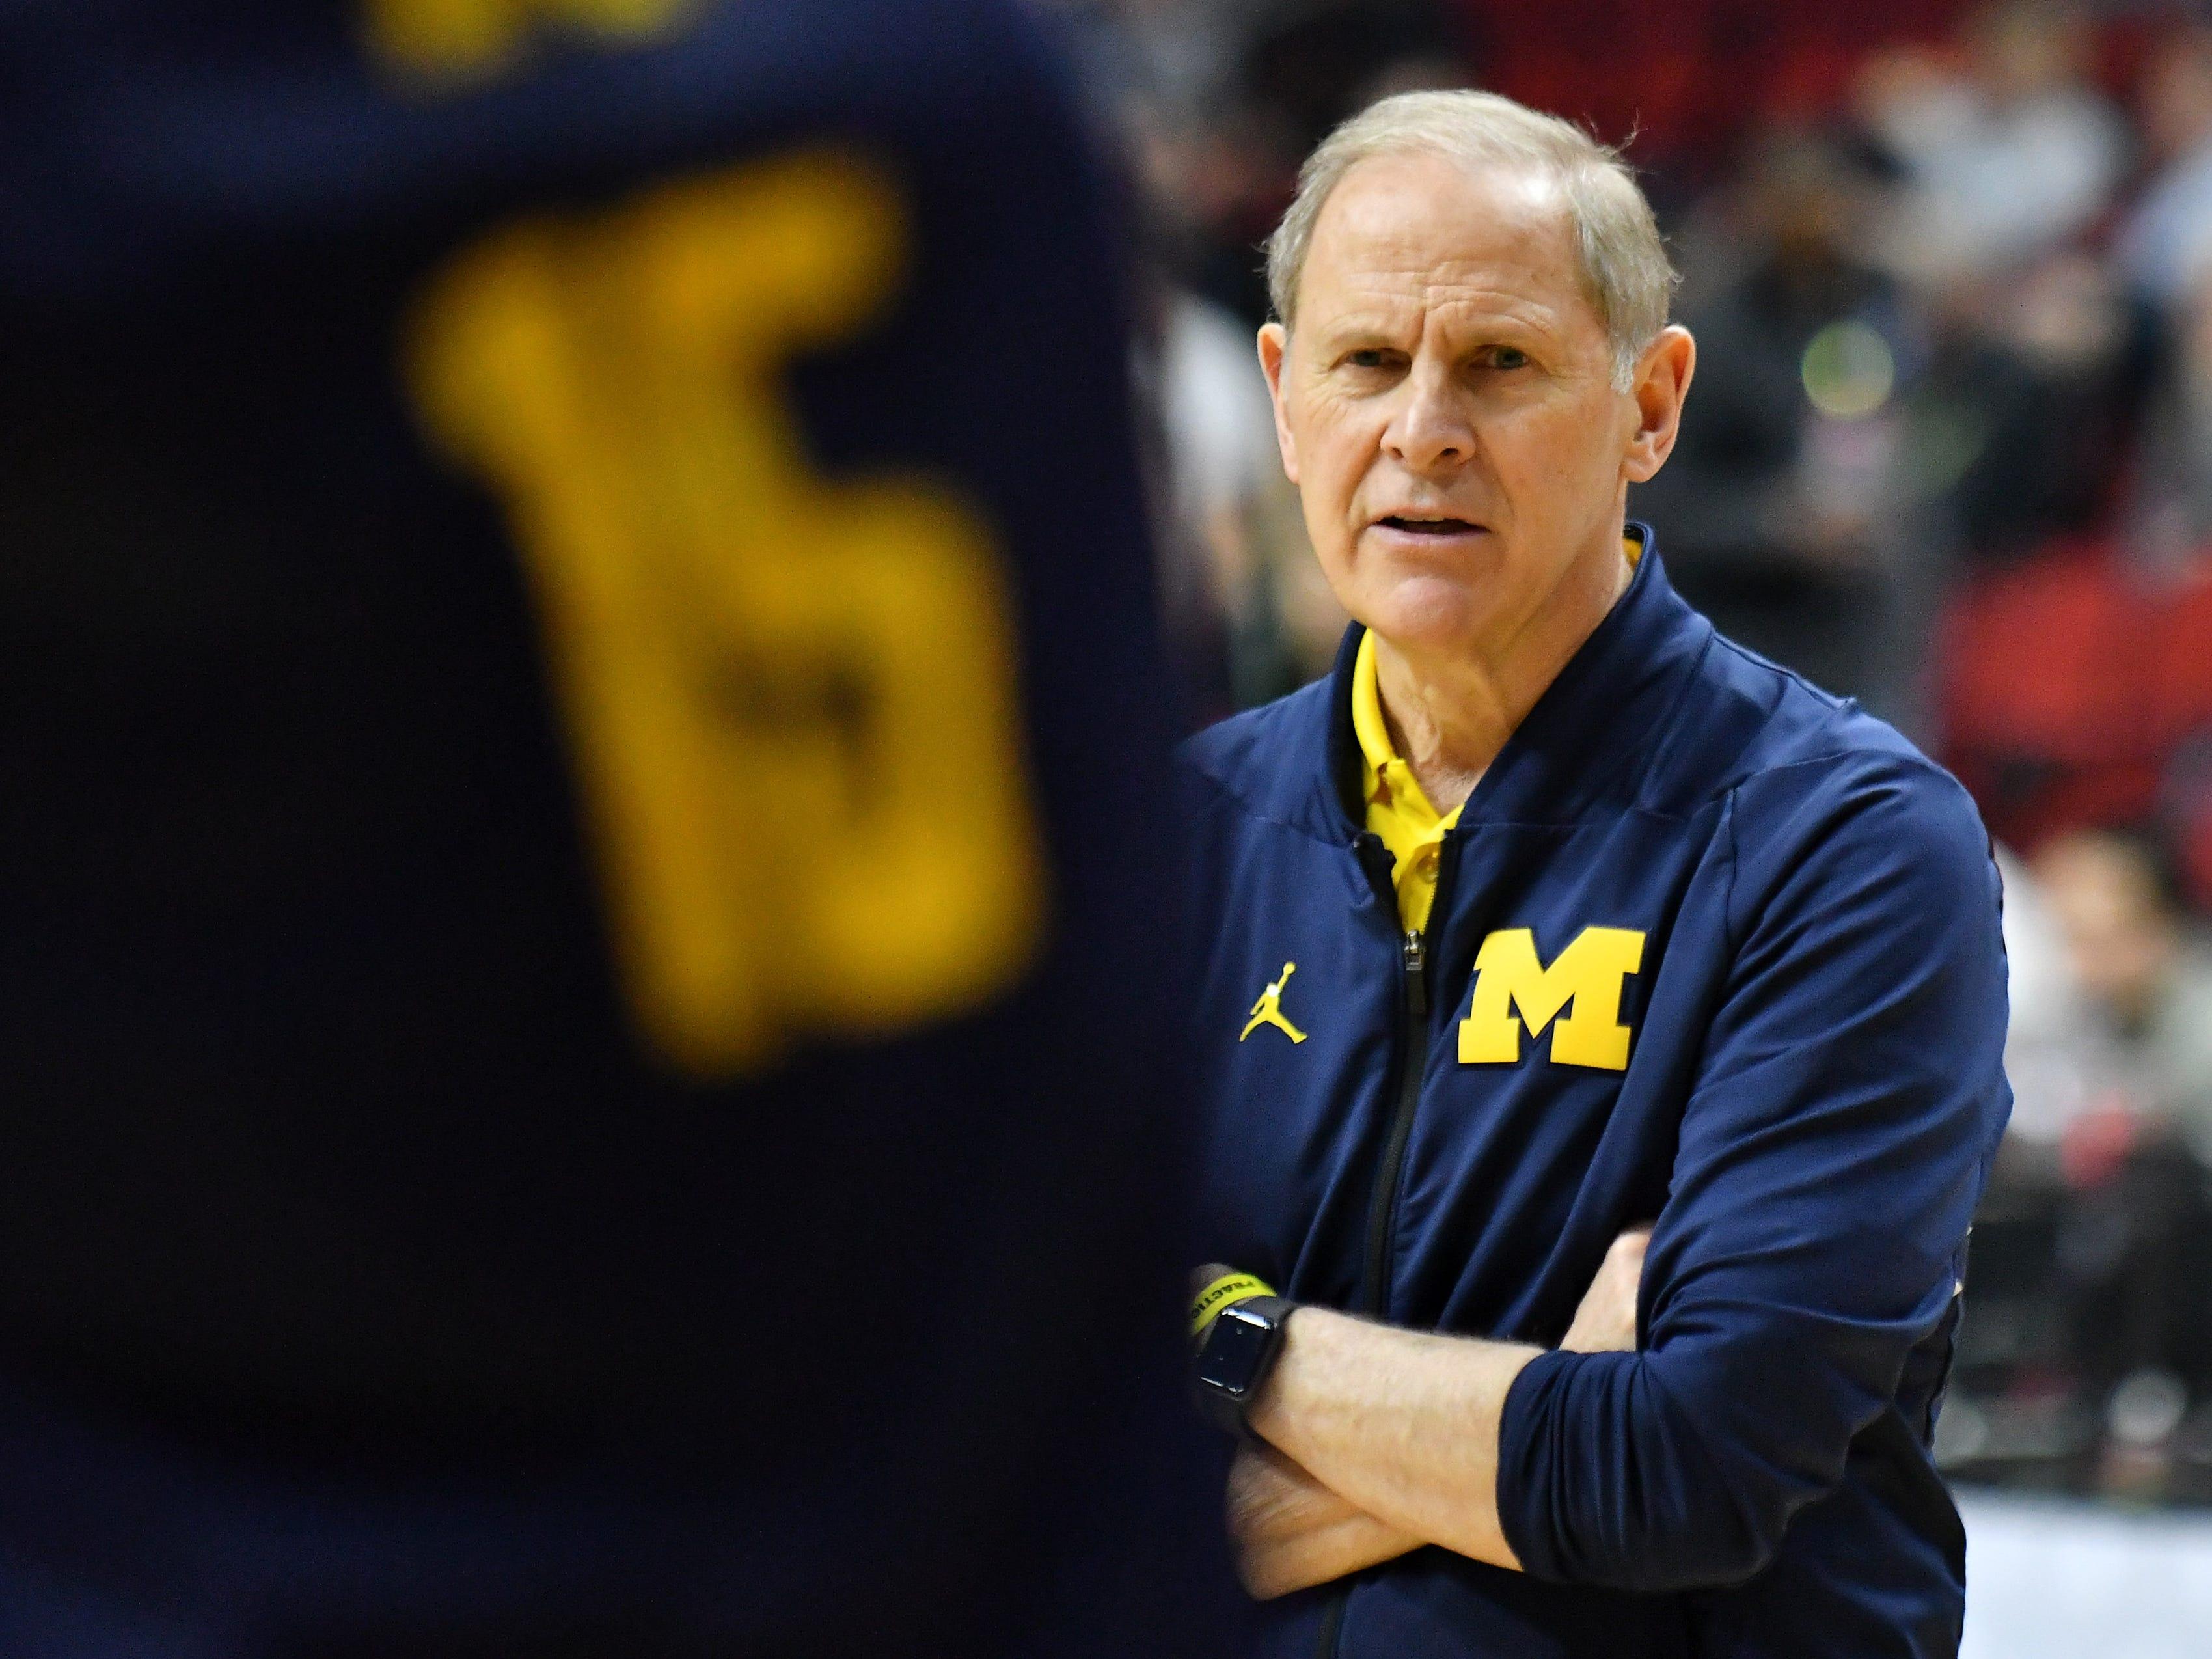 Michigan head coach John Beilein instructs during practice.